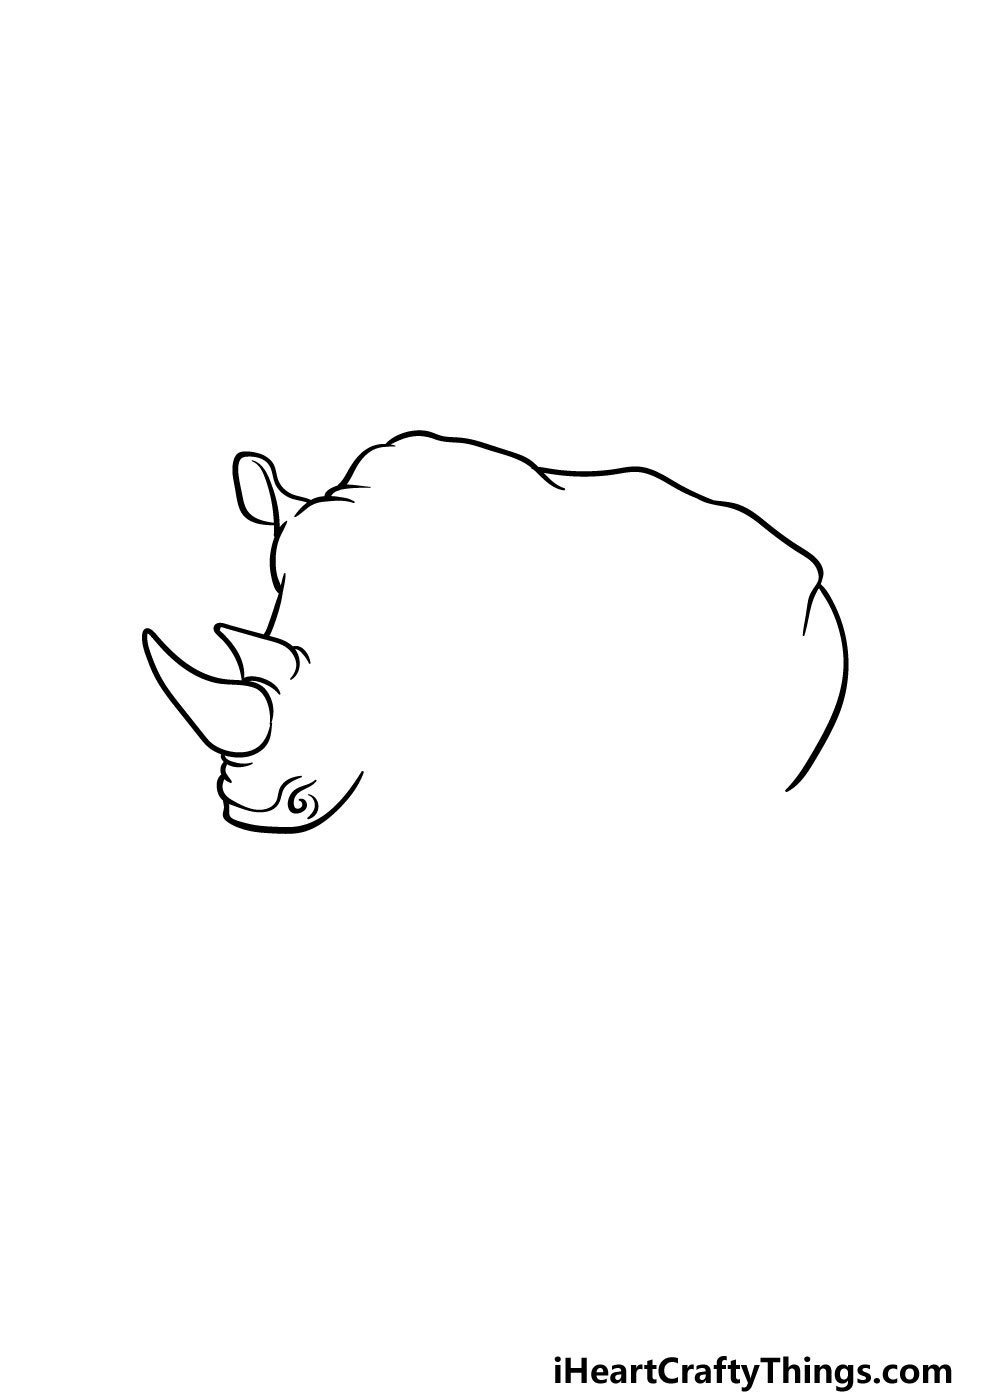 drawing a rhino step 1